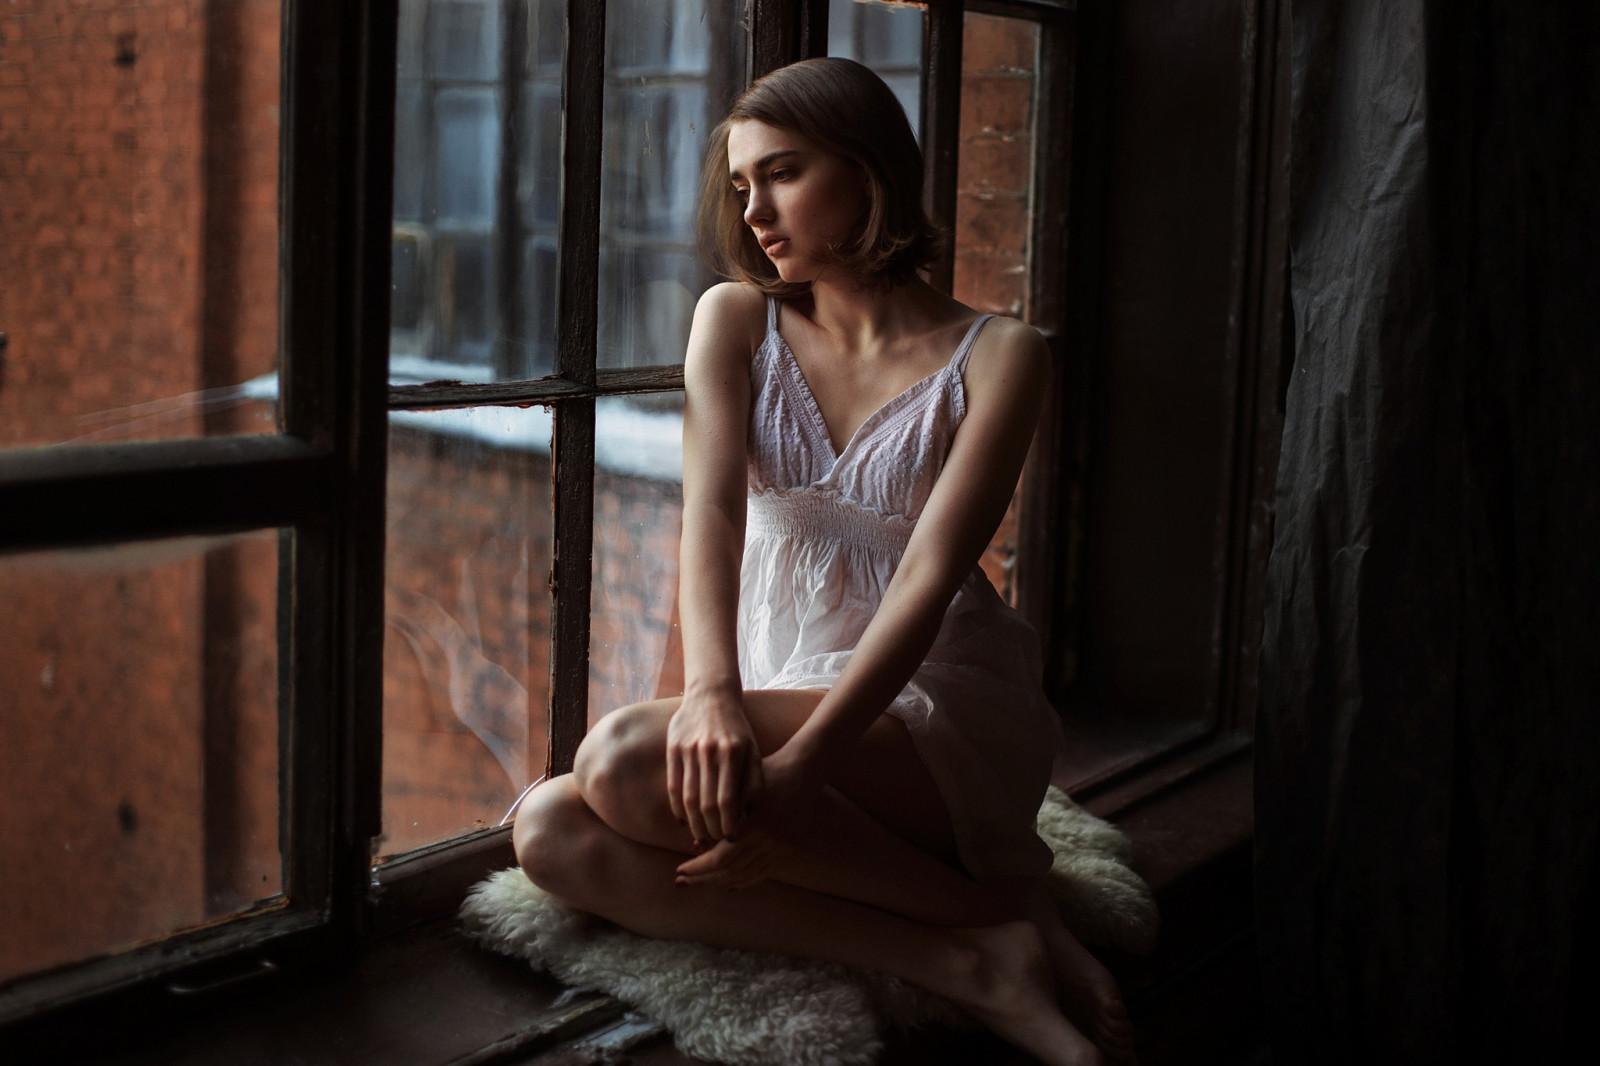 фото девушек возле окна некоторое время